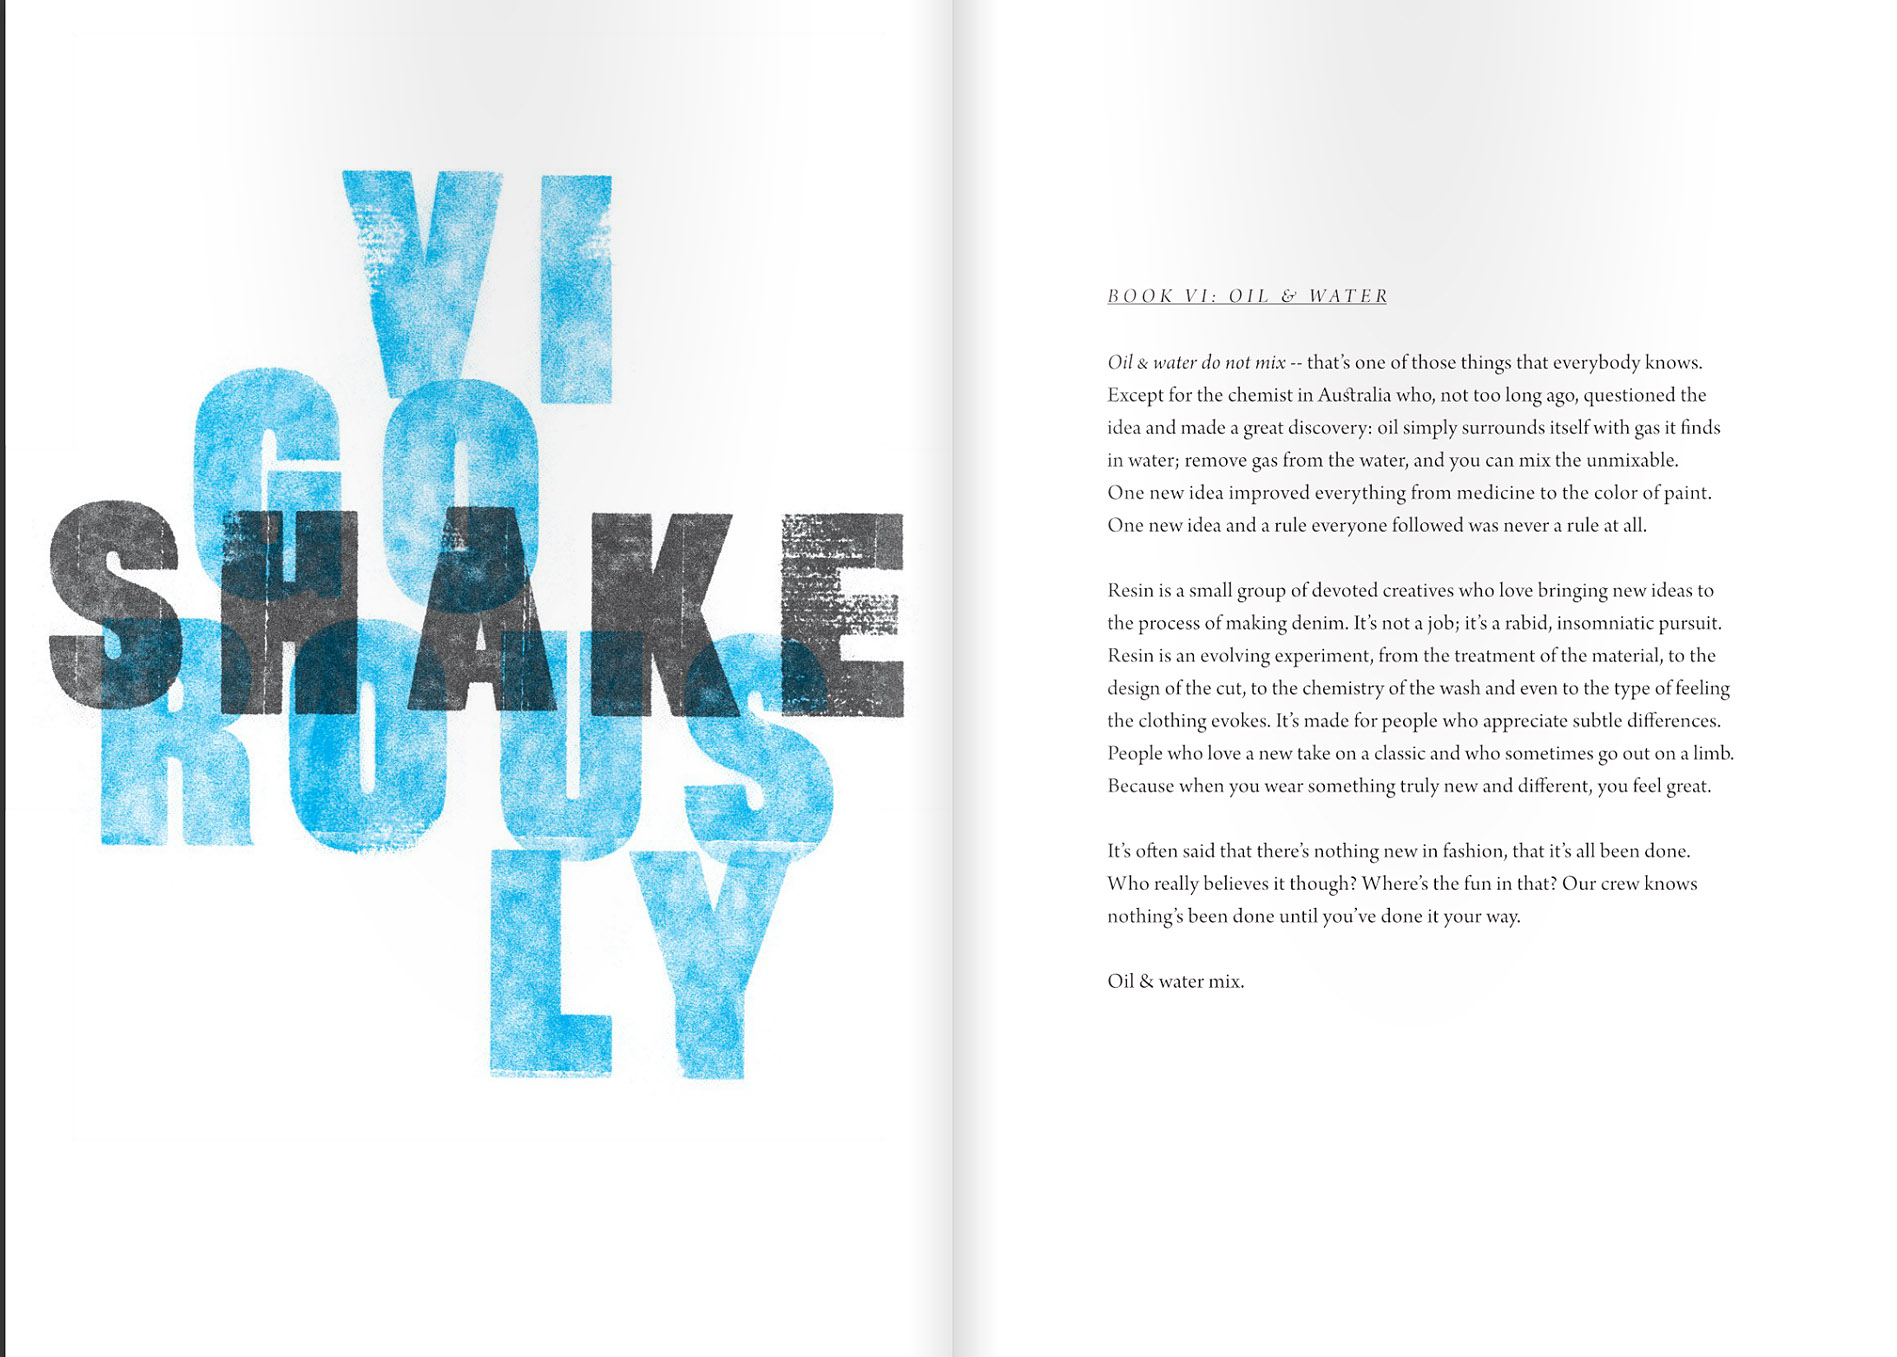 Resin Denim - Campaign Concept & Emotional Content